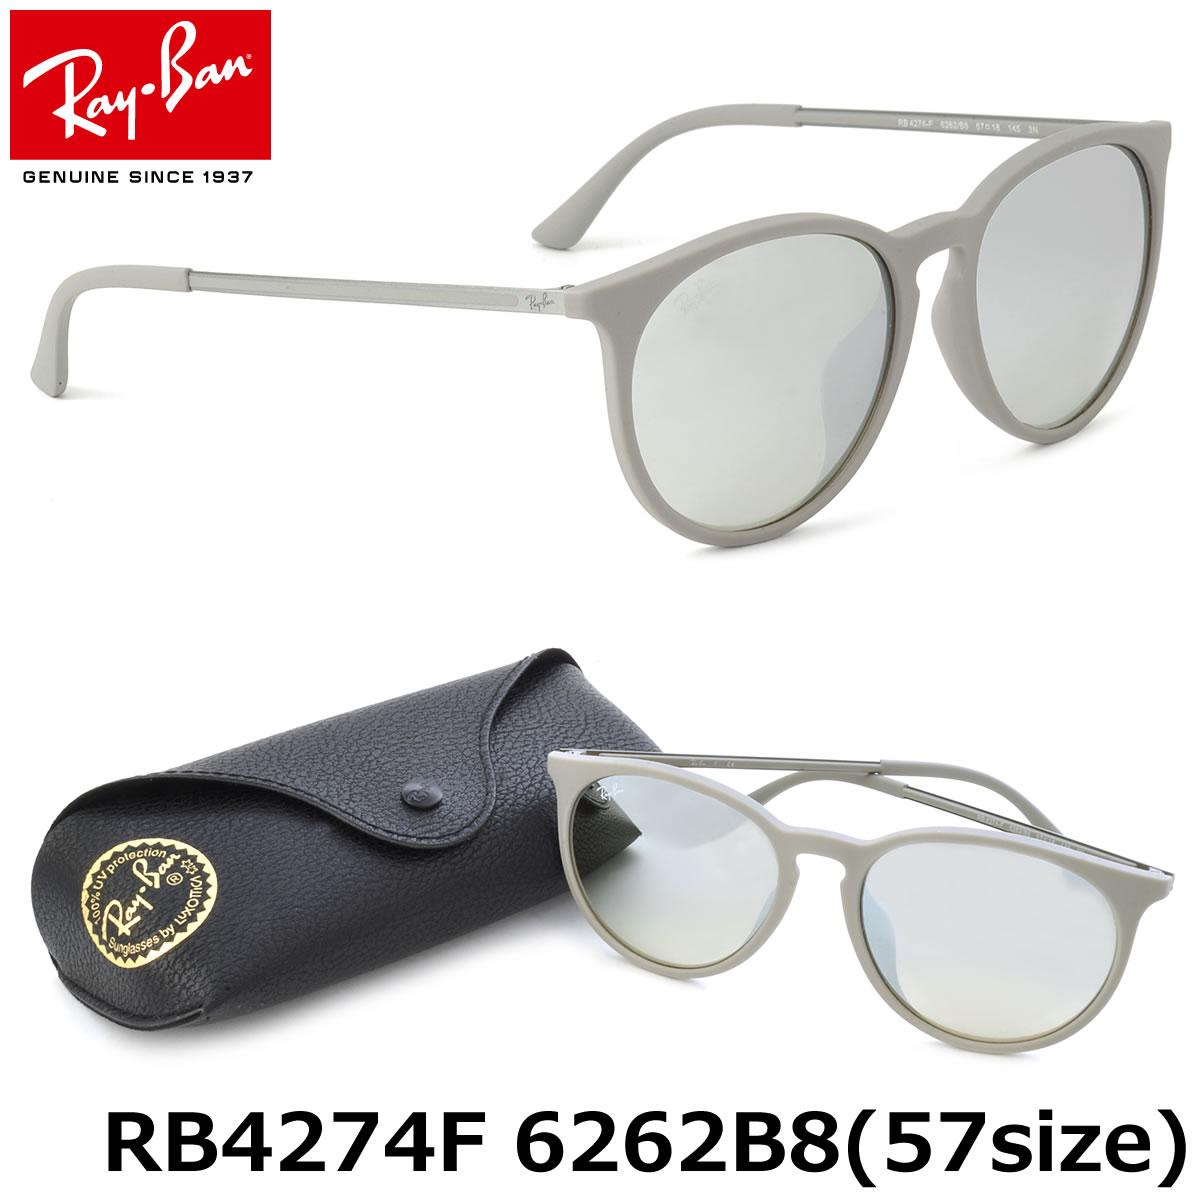 a44047a928e Major nines and the front design is a distinctive Boston sunglasses. Also  staple